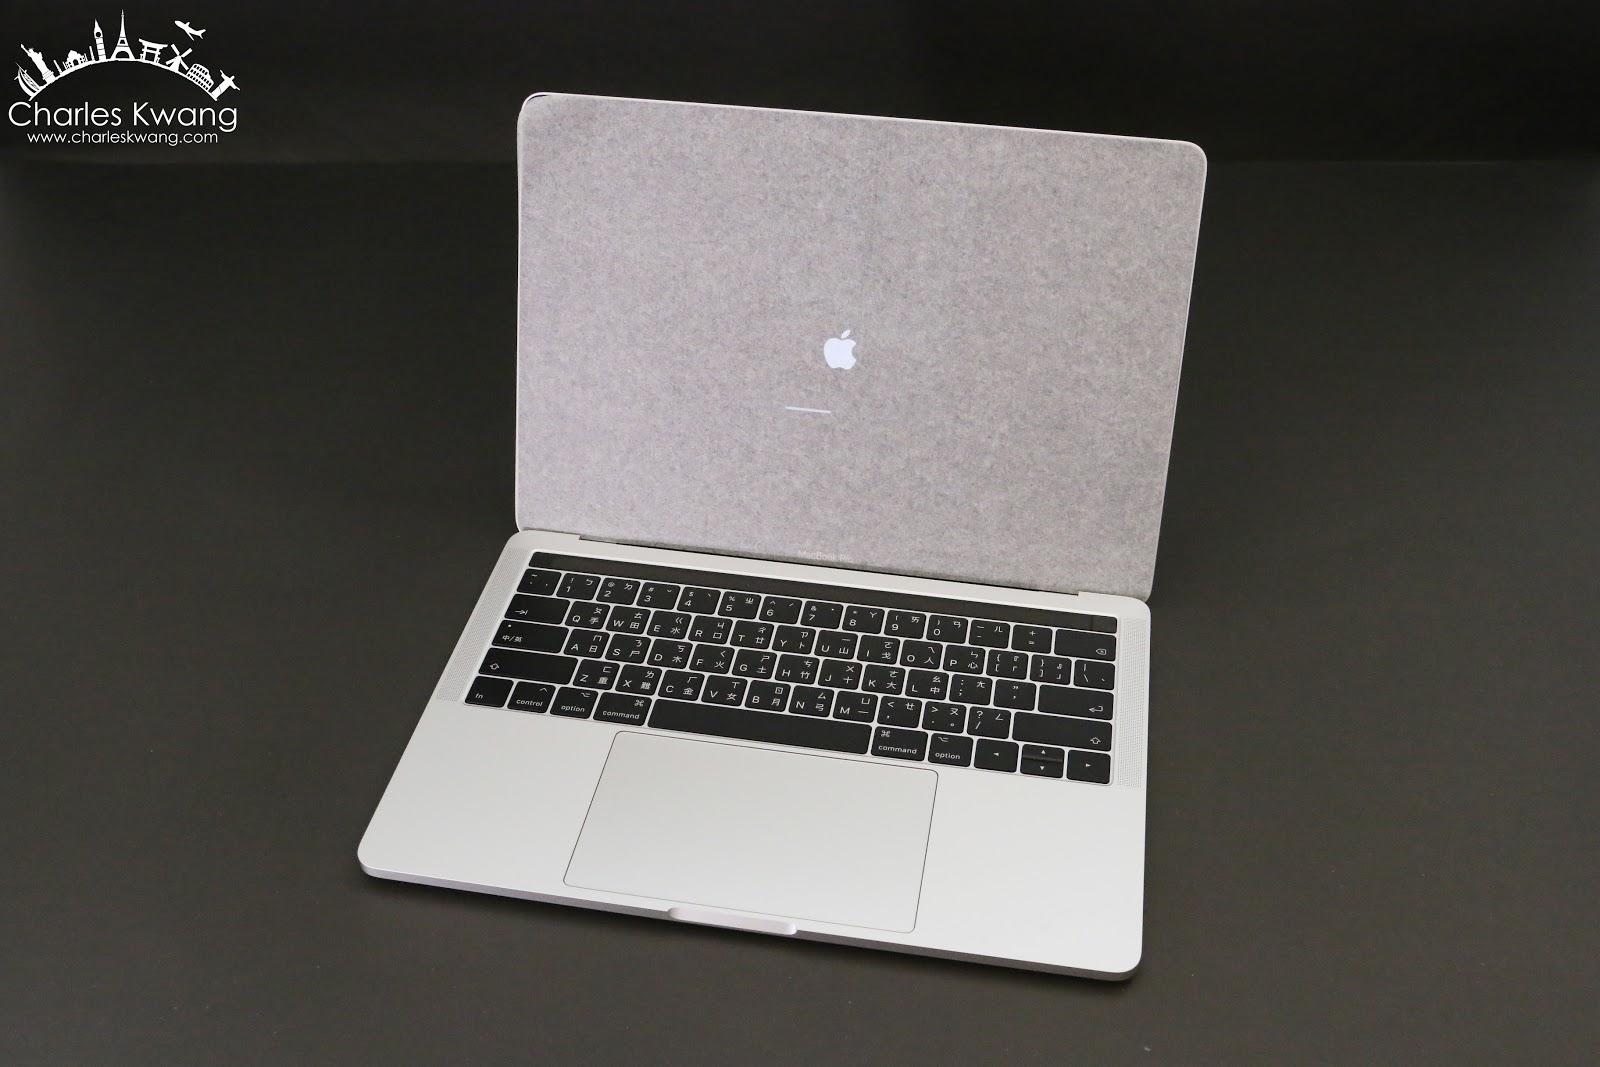 「3C科技開箱文」2017 Apple MacBook Pro 13吋 銀色 with Touch Bar 和 Touch ID 圖文開箱分享 - Charles Kwang 的美食慢遊